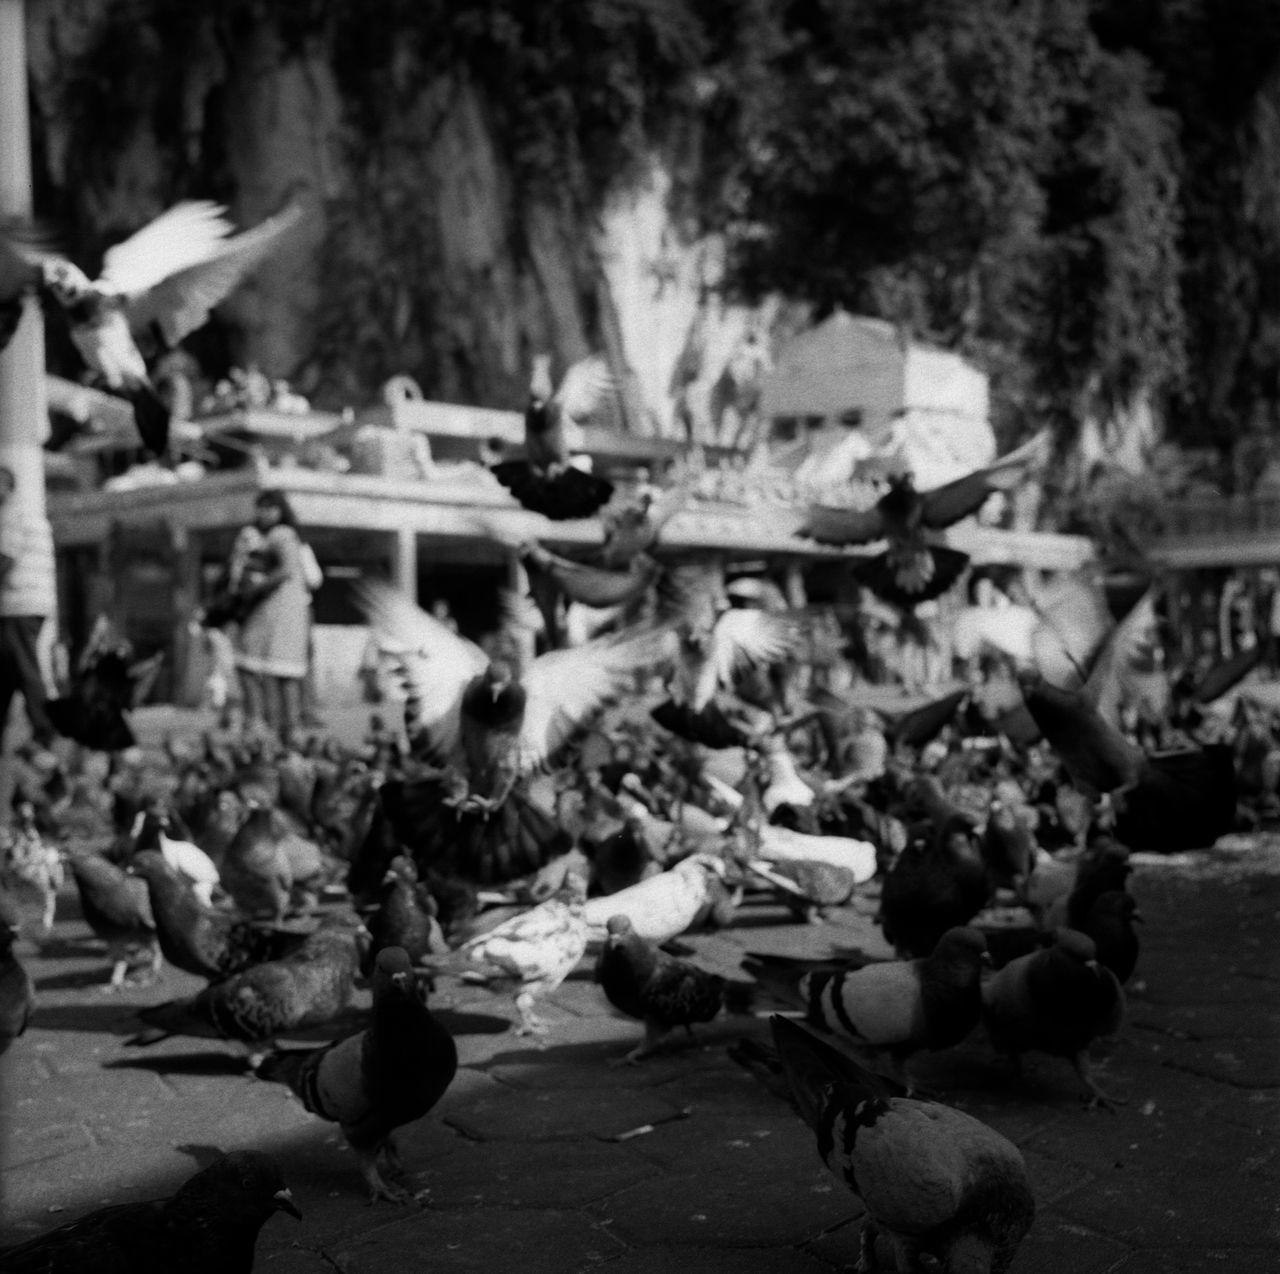 Batu Caves on film 005. Taken with the Rolleiflex Spirituality Religion Streetphotography Thaipusam EyeEmMalaysia Blackandwhite Believeinfilm Filmisnotdead Black And White Street Photography White Background Black And White Photography Rolleiflex Streetphoto_bw Thaipusam 2017 Spirituality Filmphotography Ishootfilm Birds Birds Of EyeEm